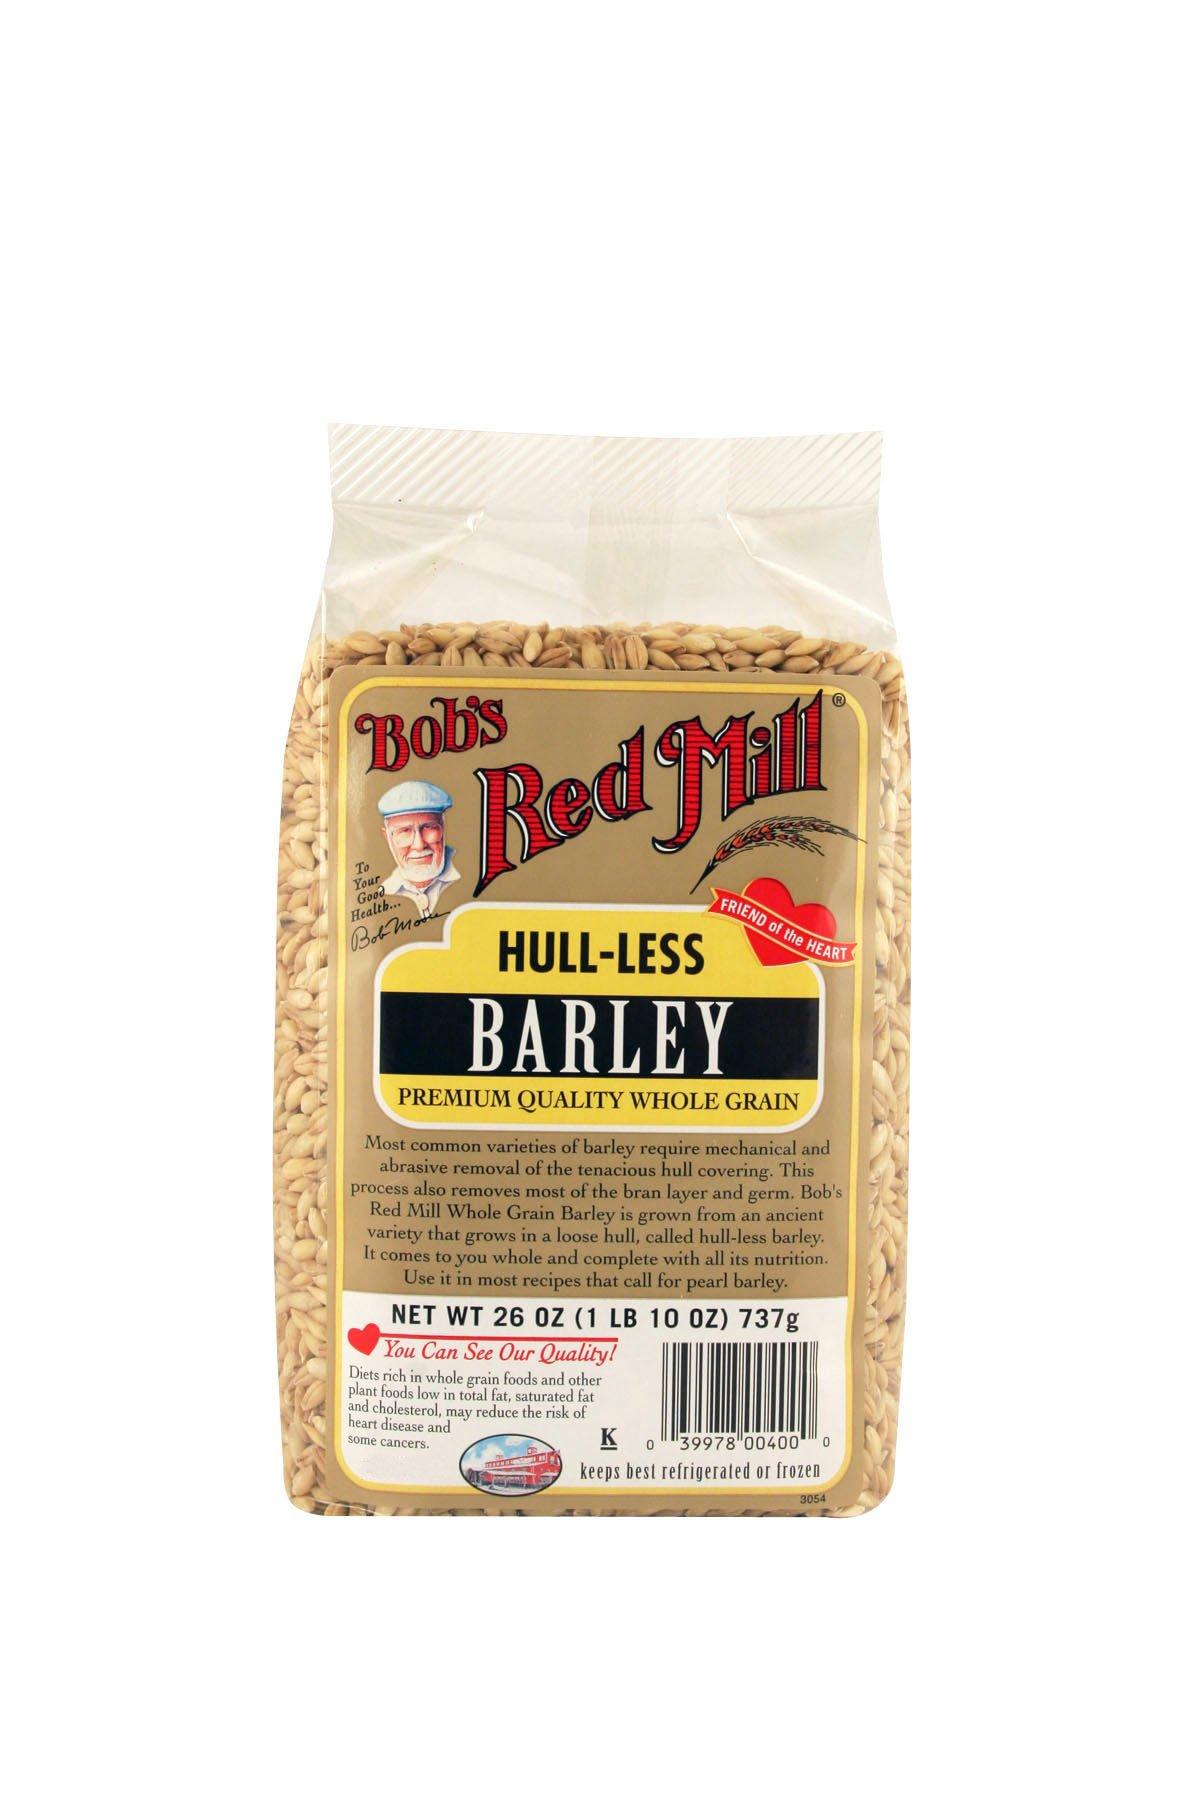 Bob's Red Mill Hull-Less Whole Barley, 26-ounce